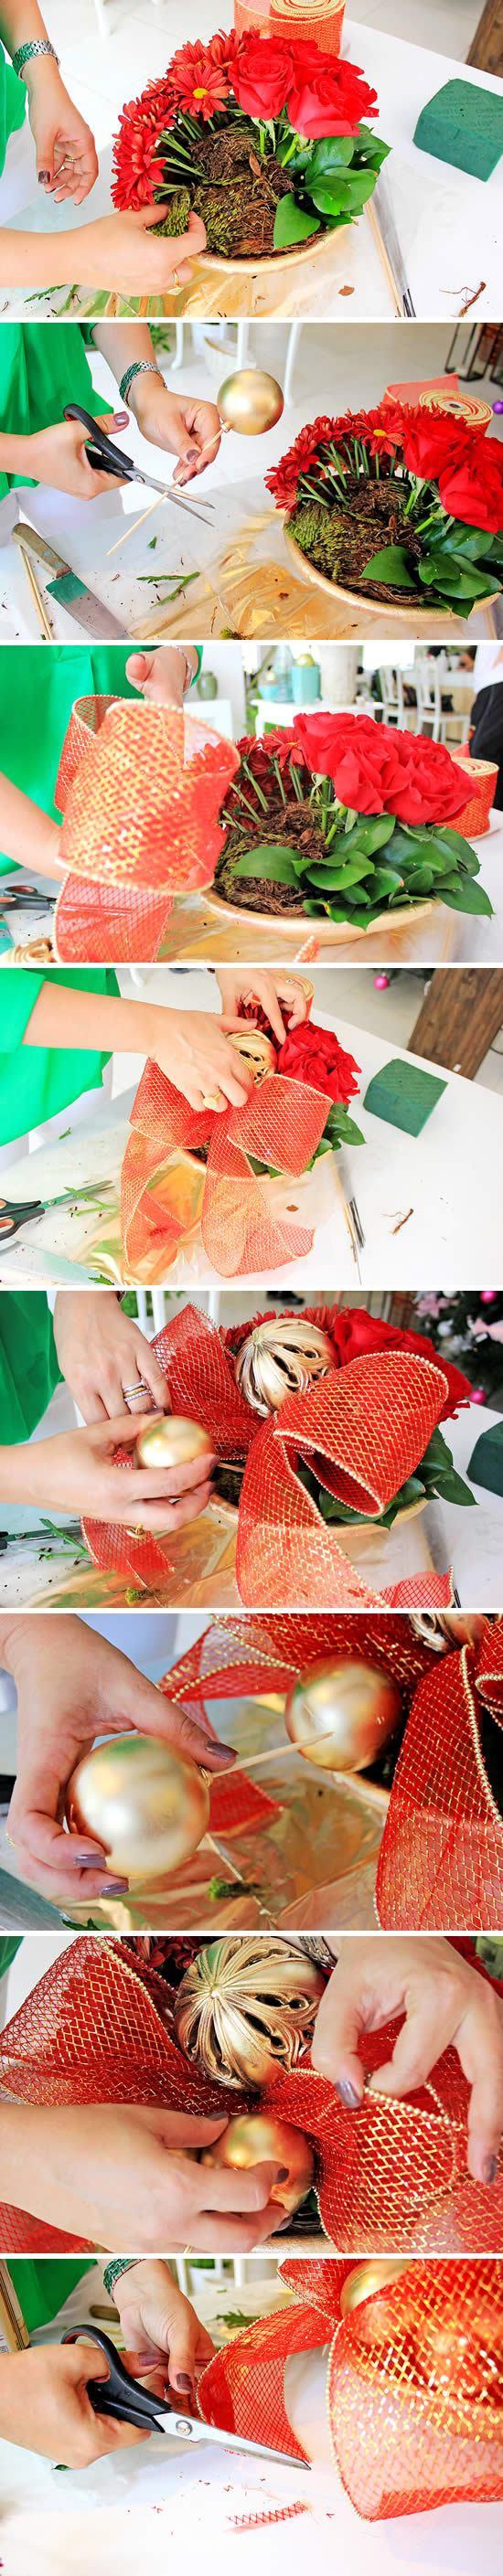 Últimos ajustes para o artesanato floral natalino